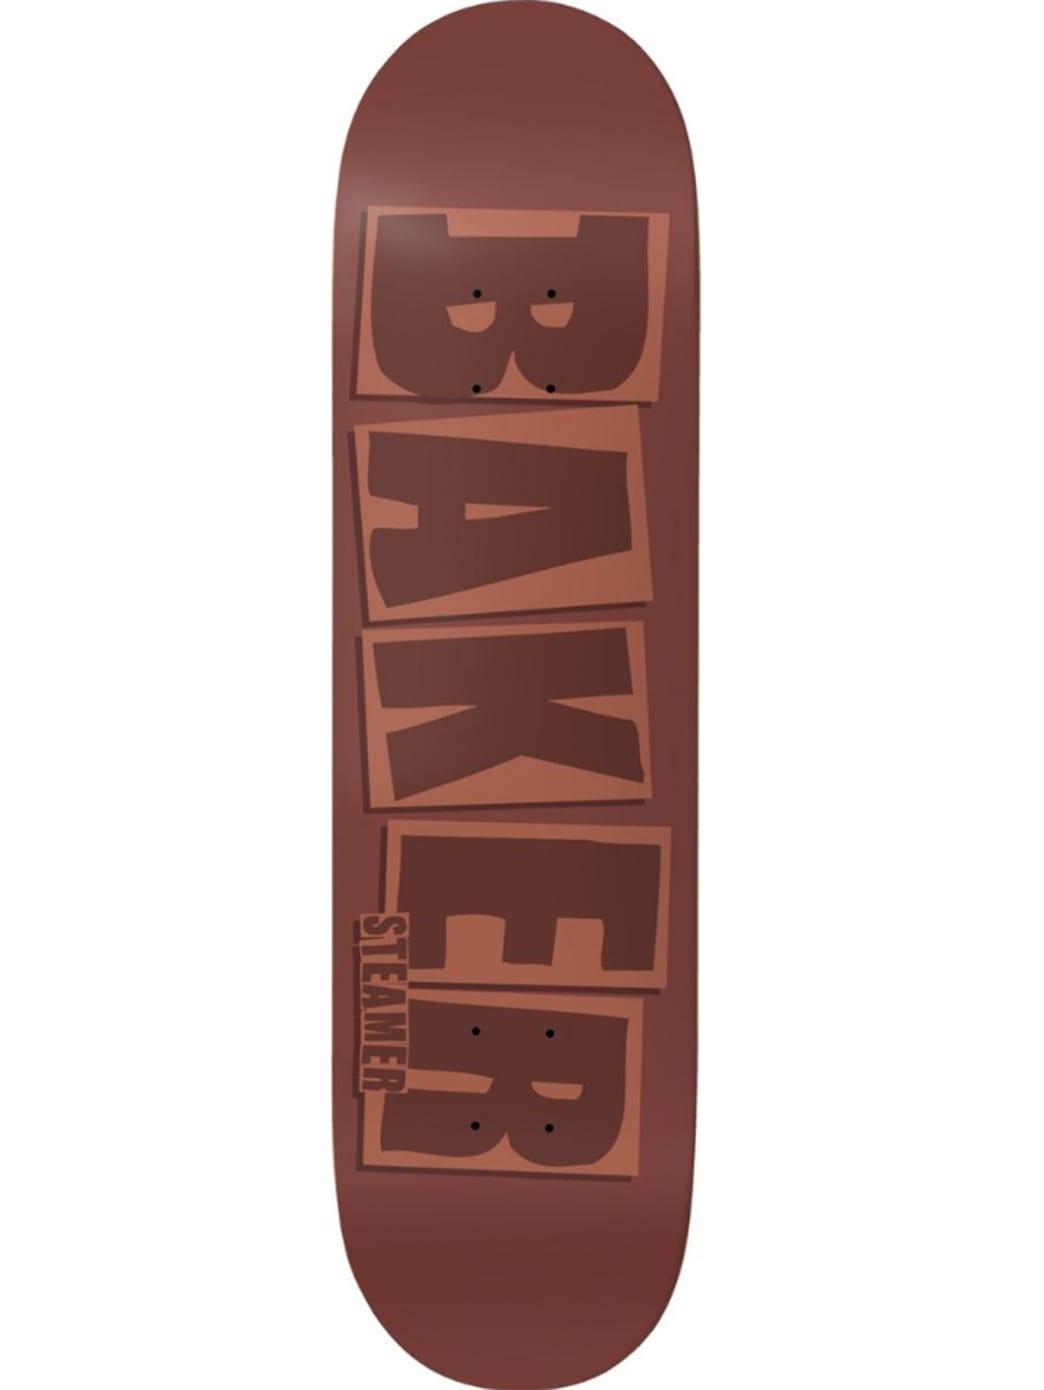 Baker Steamer Brand Name Brick Deck 8.125 | Deck by Baker Skateboards 1